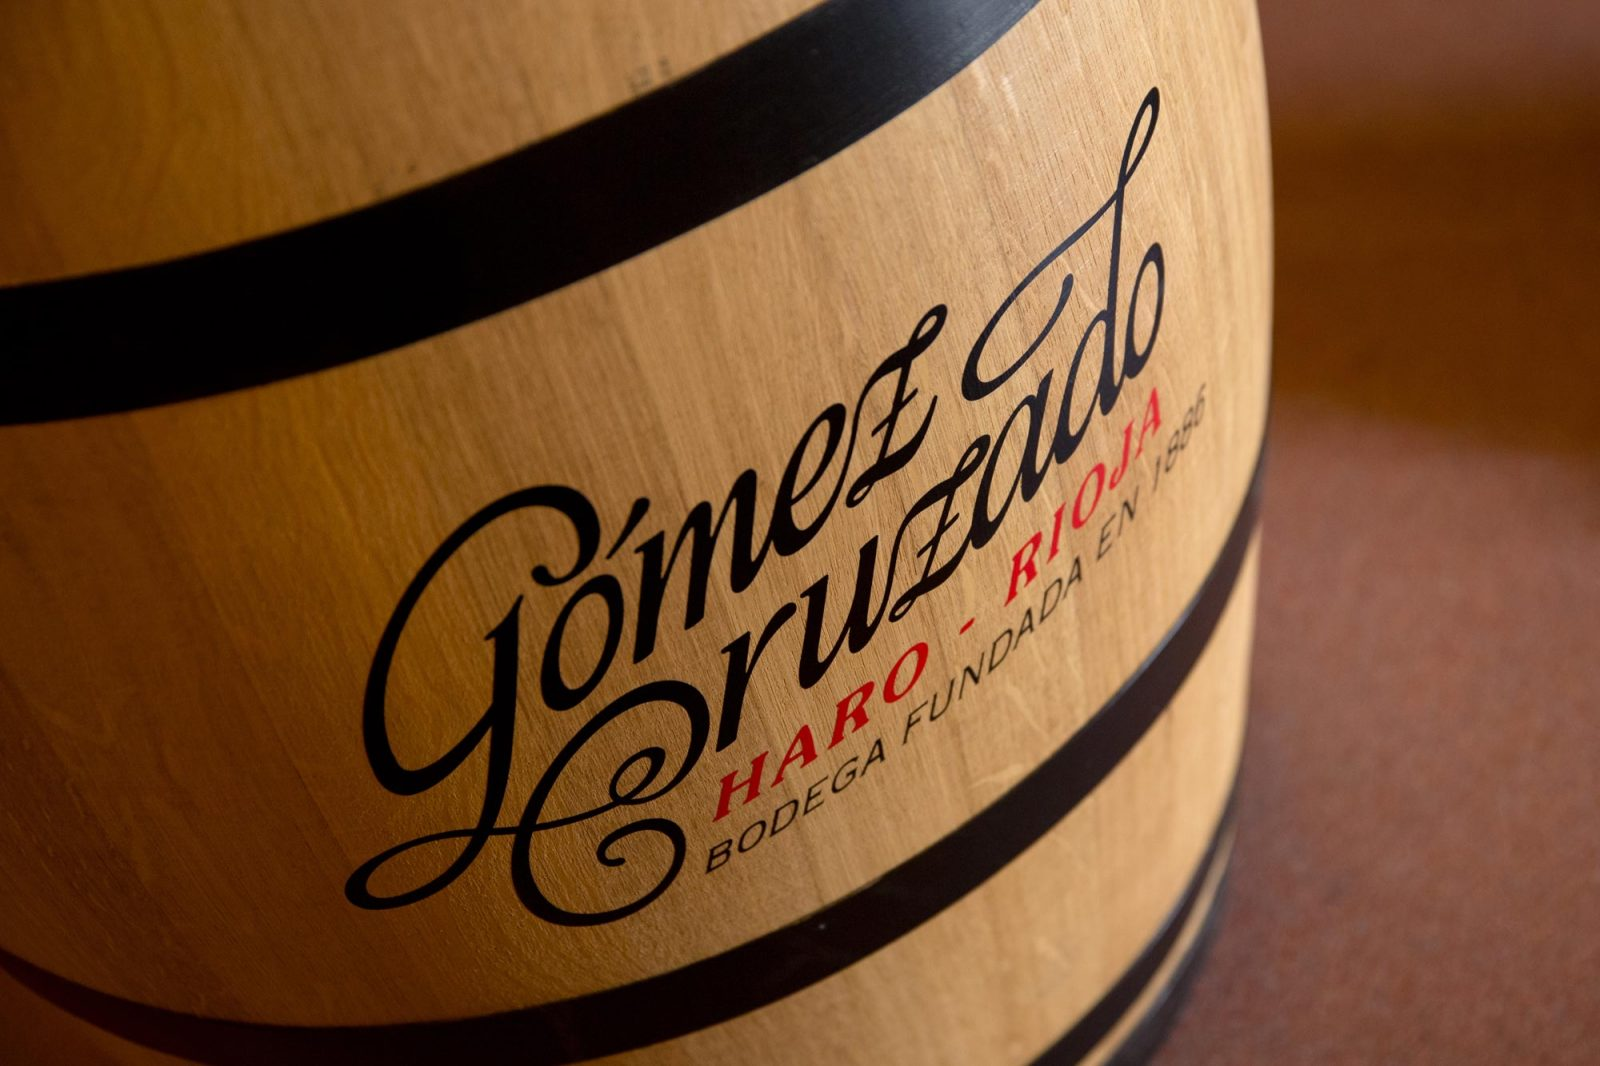 Barrica de Gómez Cruzado Bodega de Rioja Haro